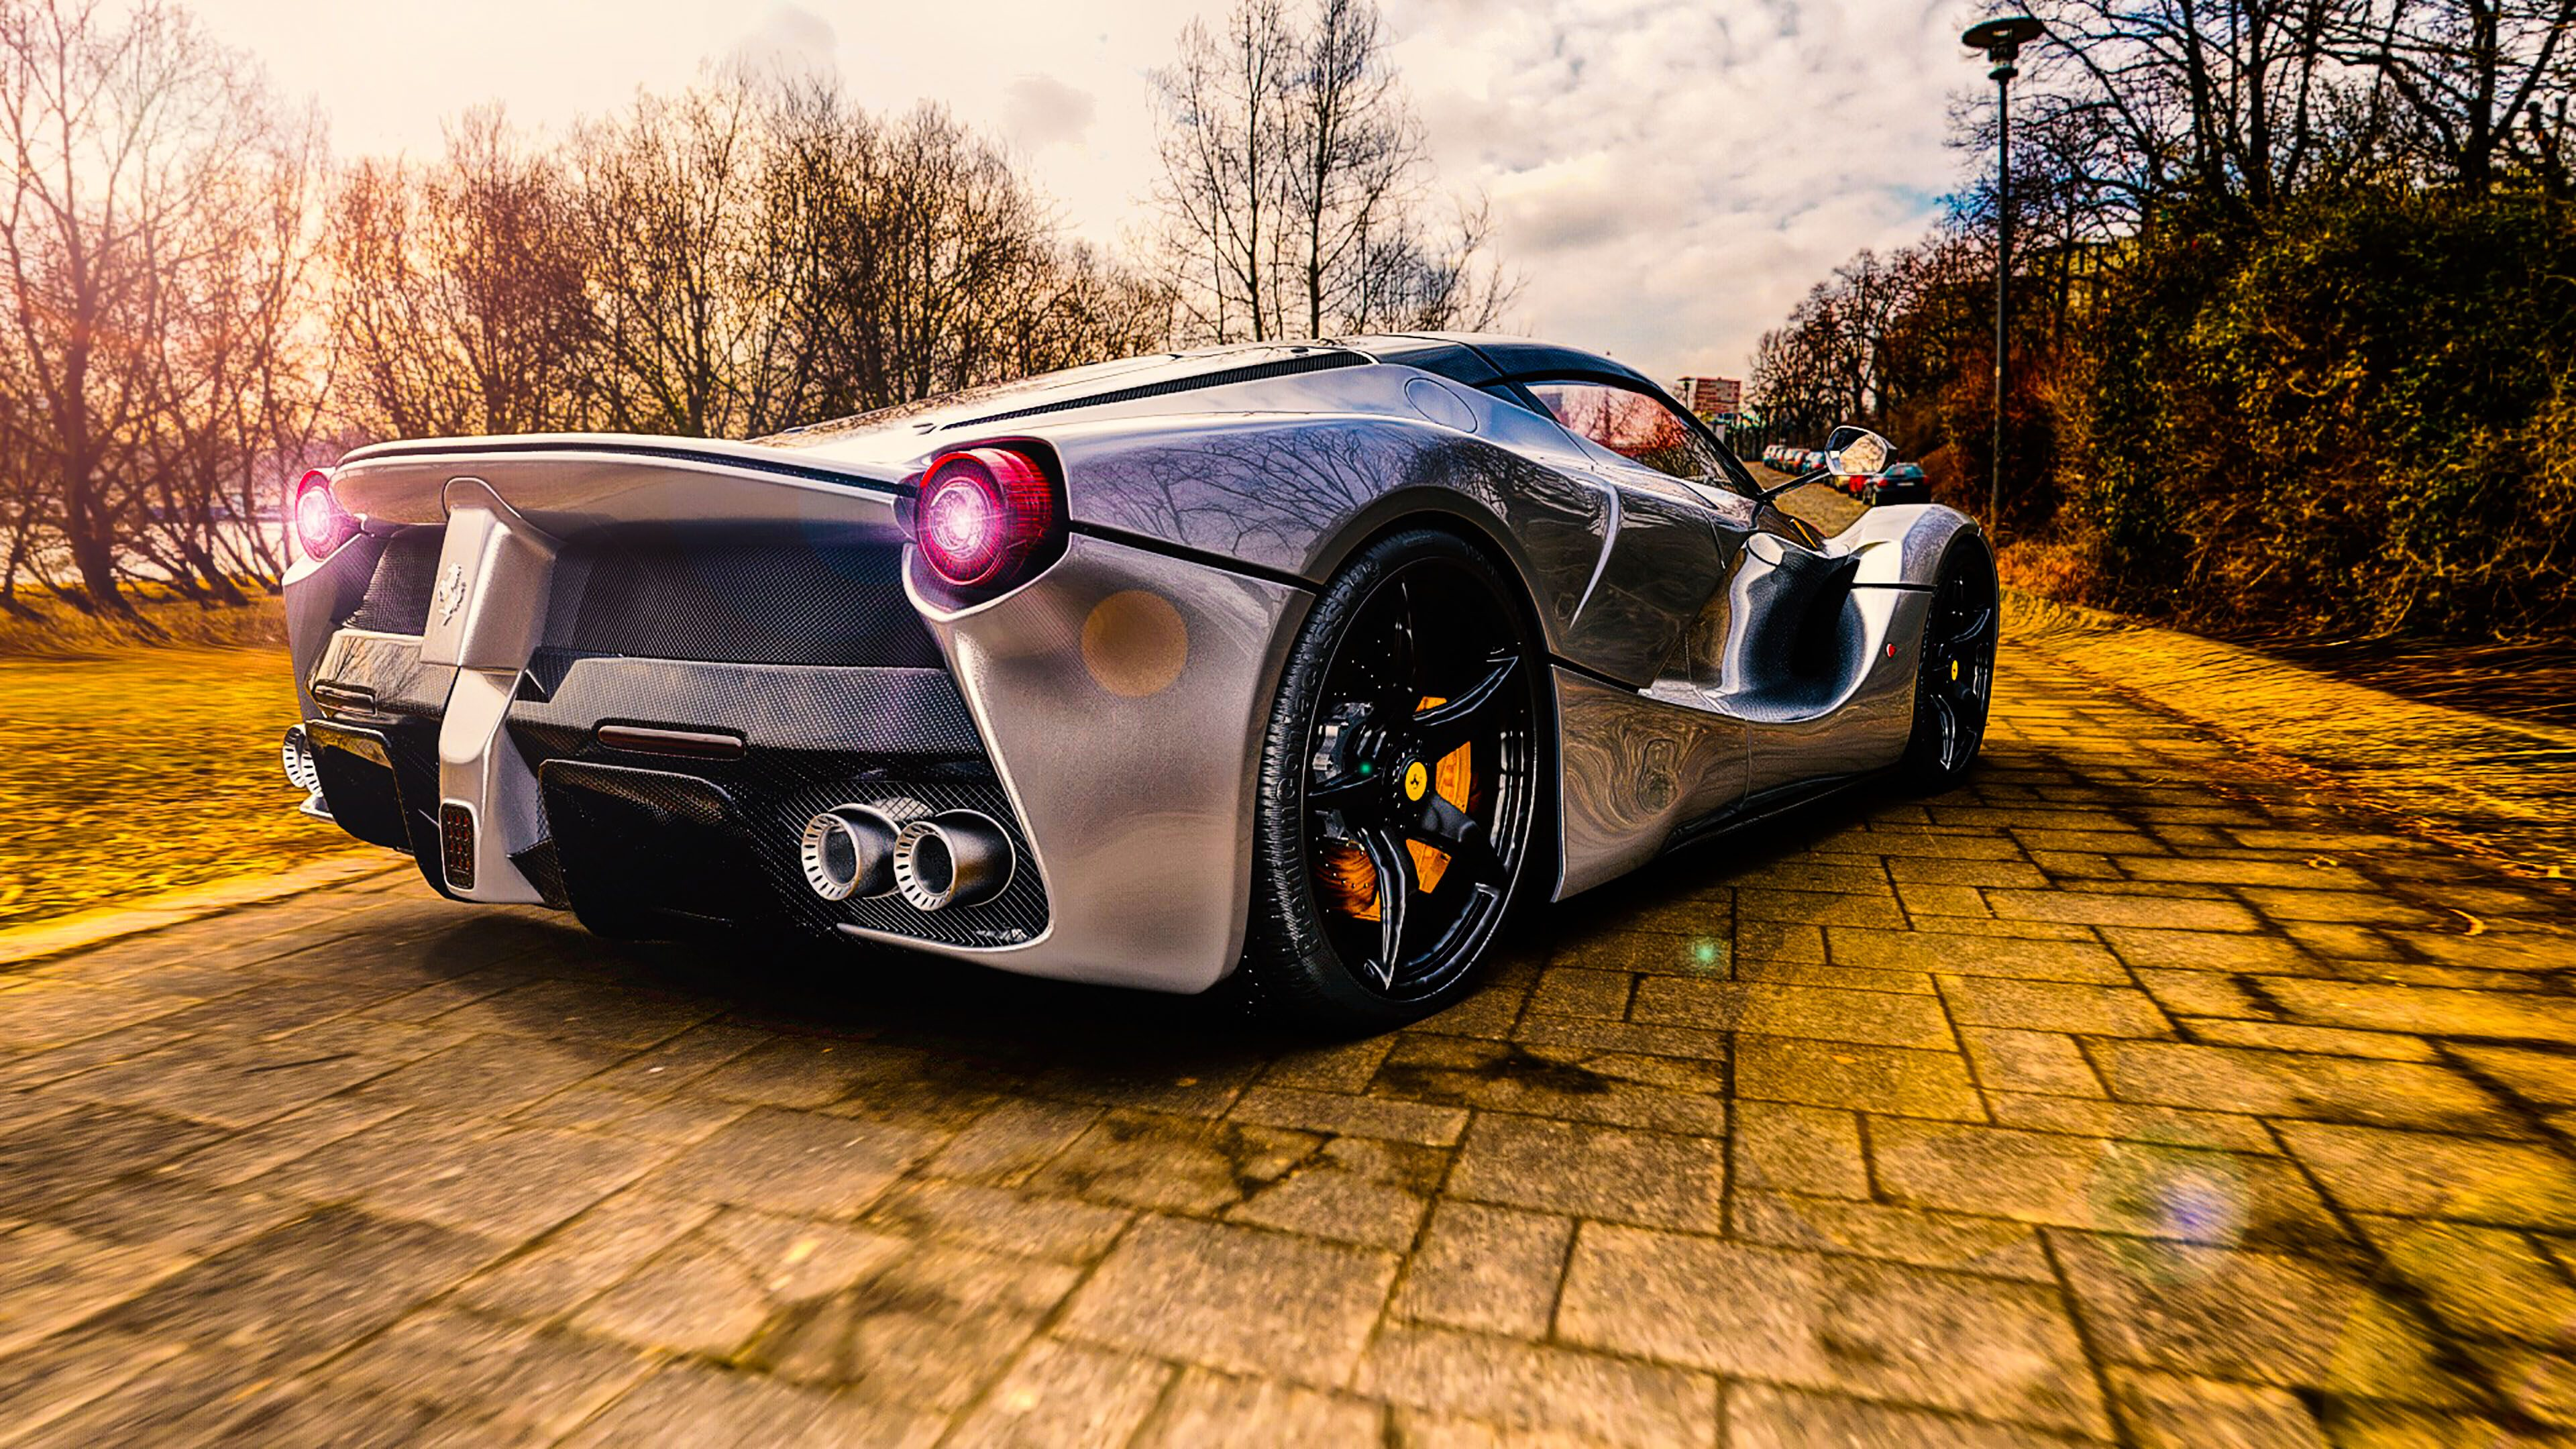 Car Ferrari Sport Car Silver Luxury Car 4K Wallpaper ...